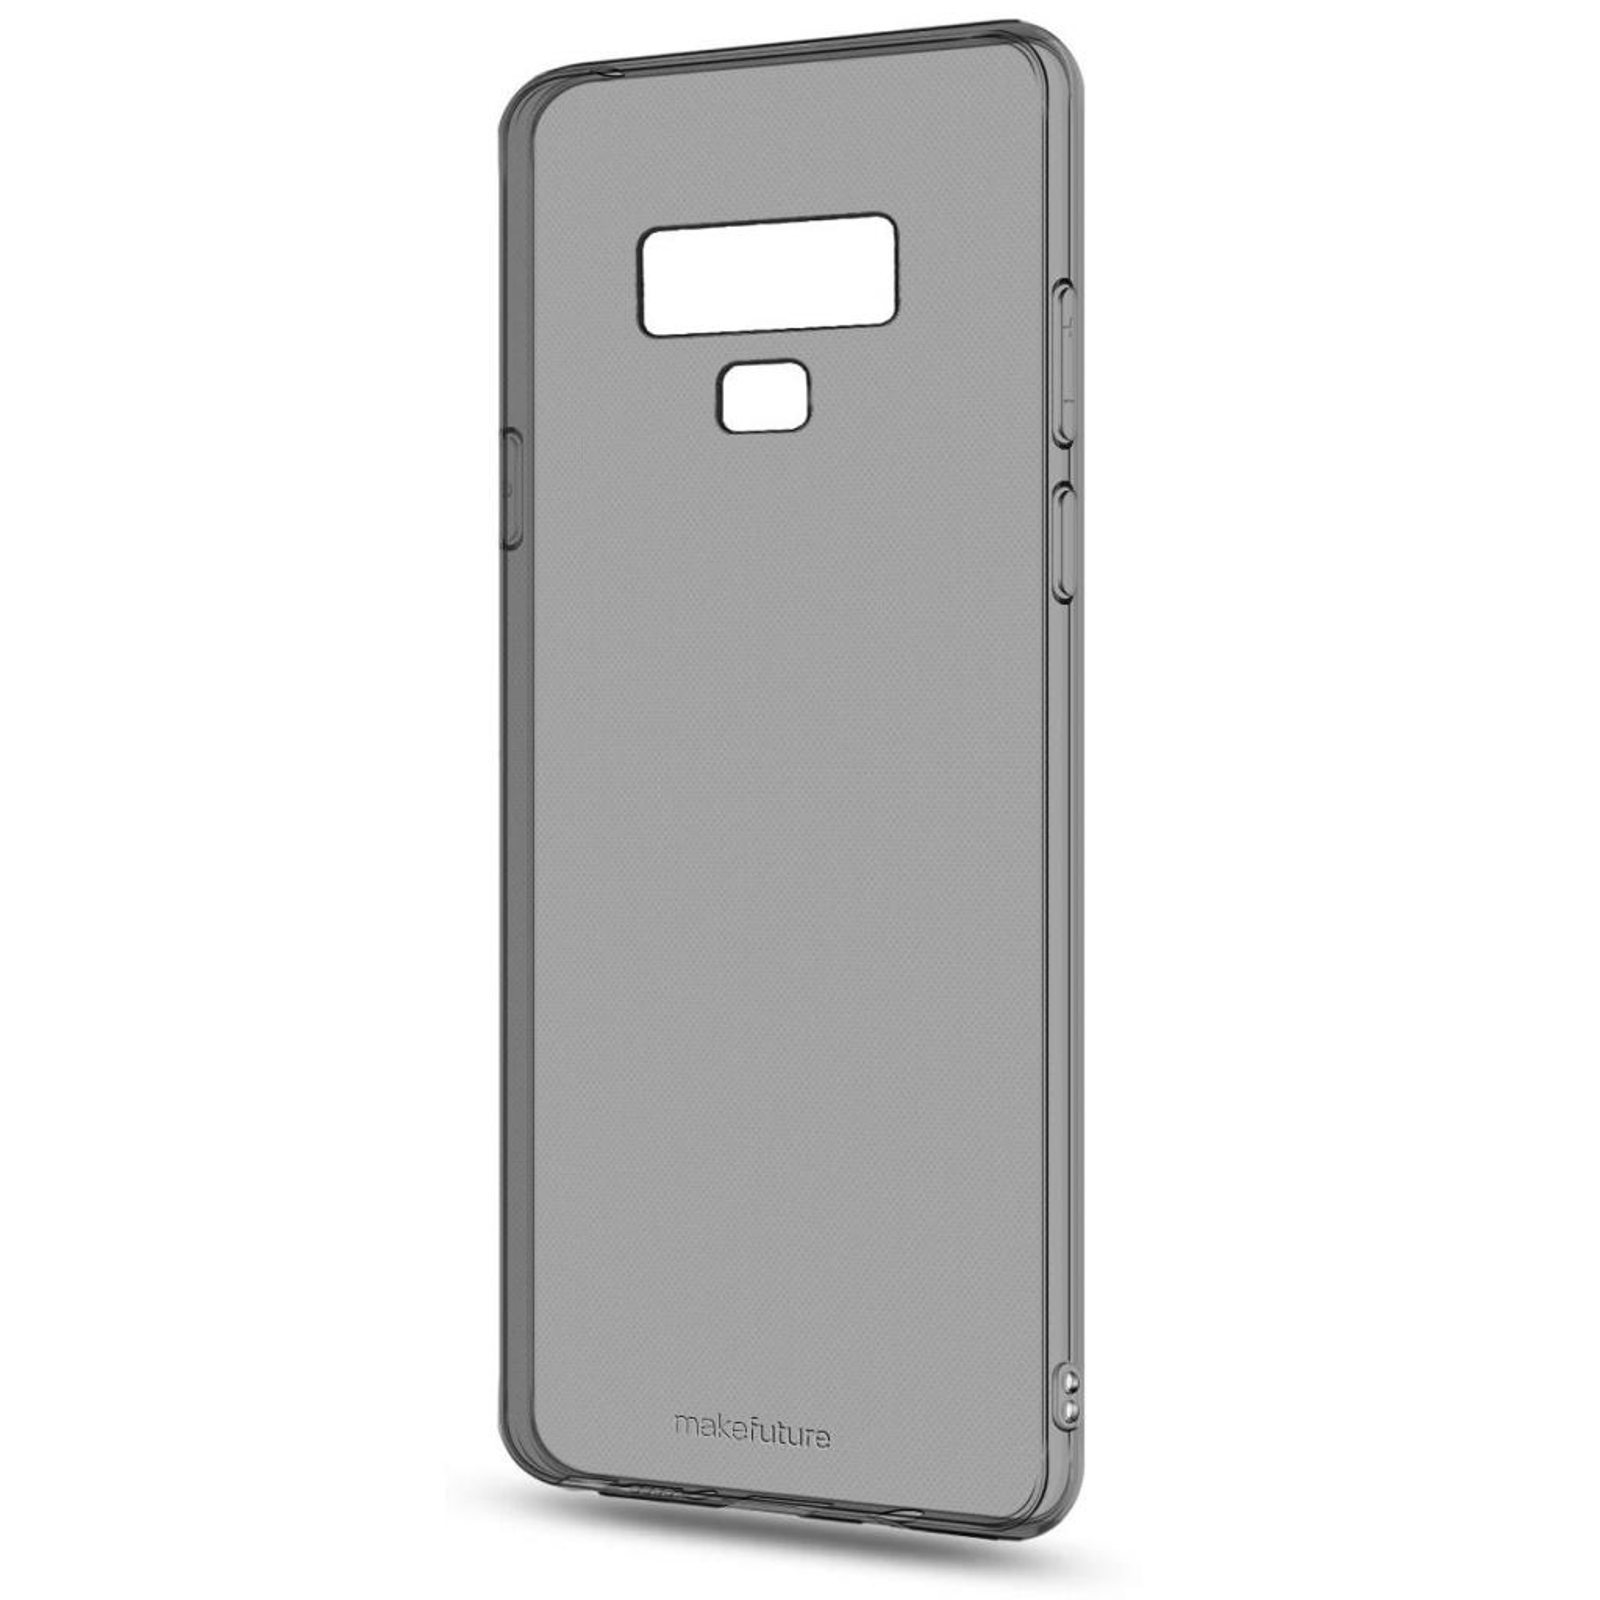 Чехол для моб. телефона MakeFuture Air Case (TPU) Samsung Note 9 Black (MCA-SN9BK)